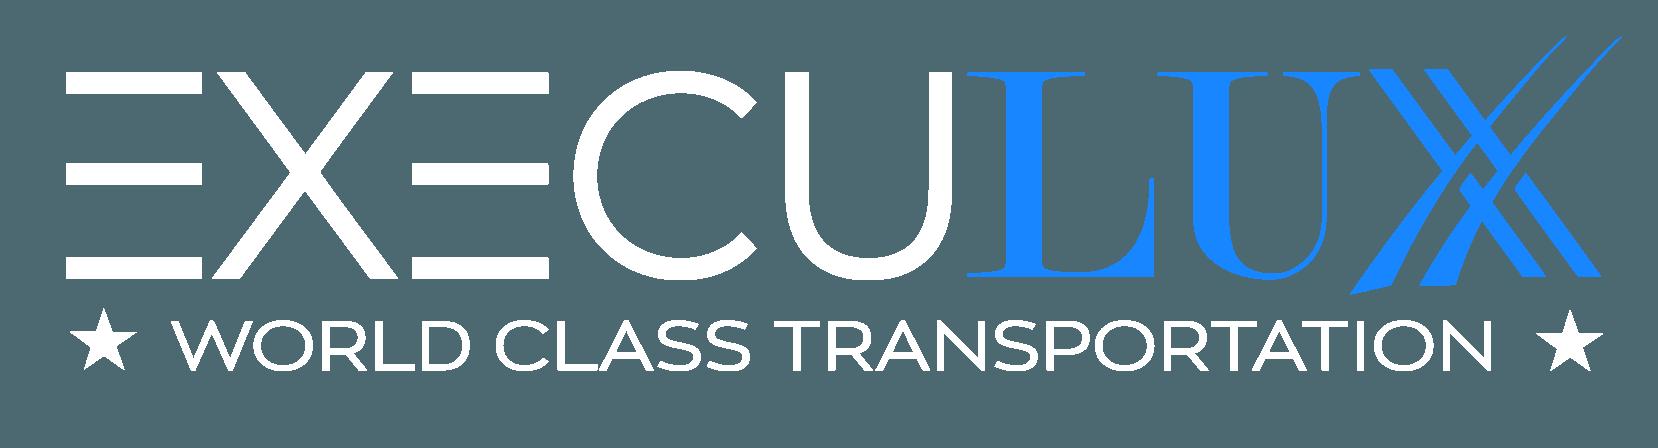 EXECULUXX Transportation Logo